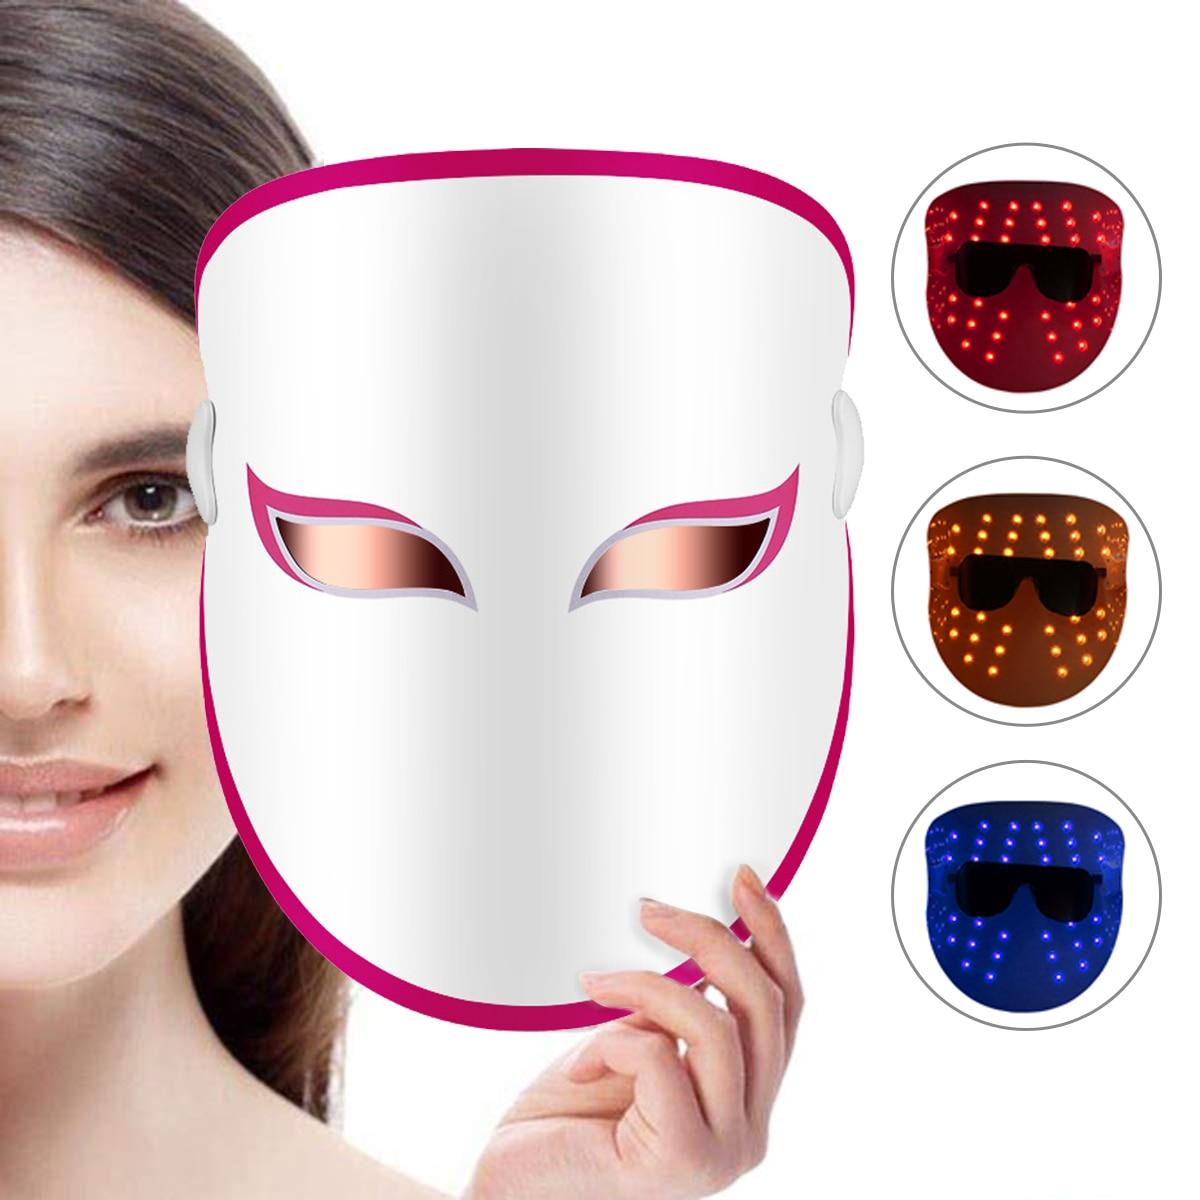 Anti-aging Photon Light Mask LED Light Therapy Mask Skin Rejuvenation Tool 32 LED lights Red Blue Orange Lift And Tighten Skin